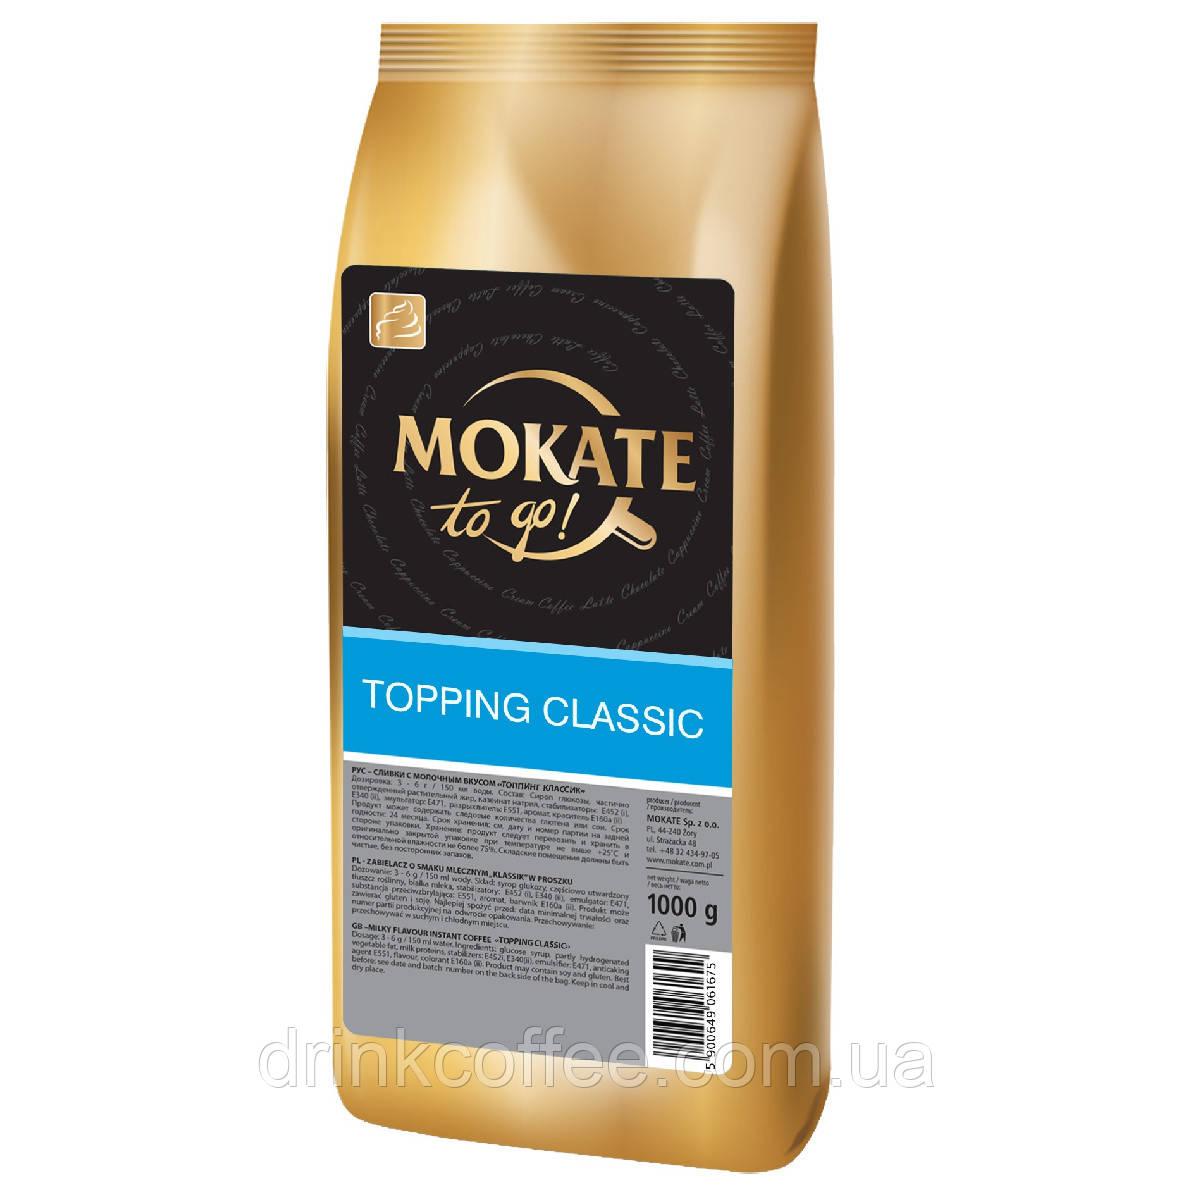 Сливки Mokate Topping Classic, Польша, 1кг